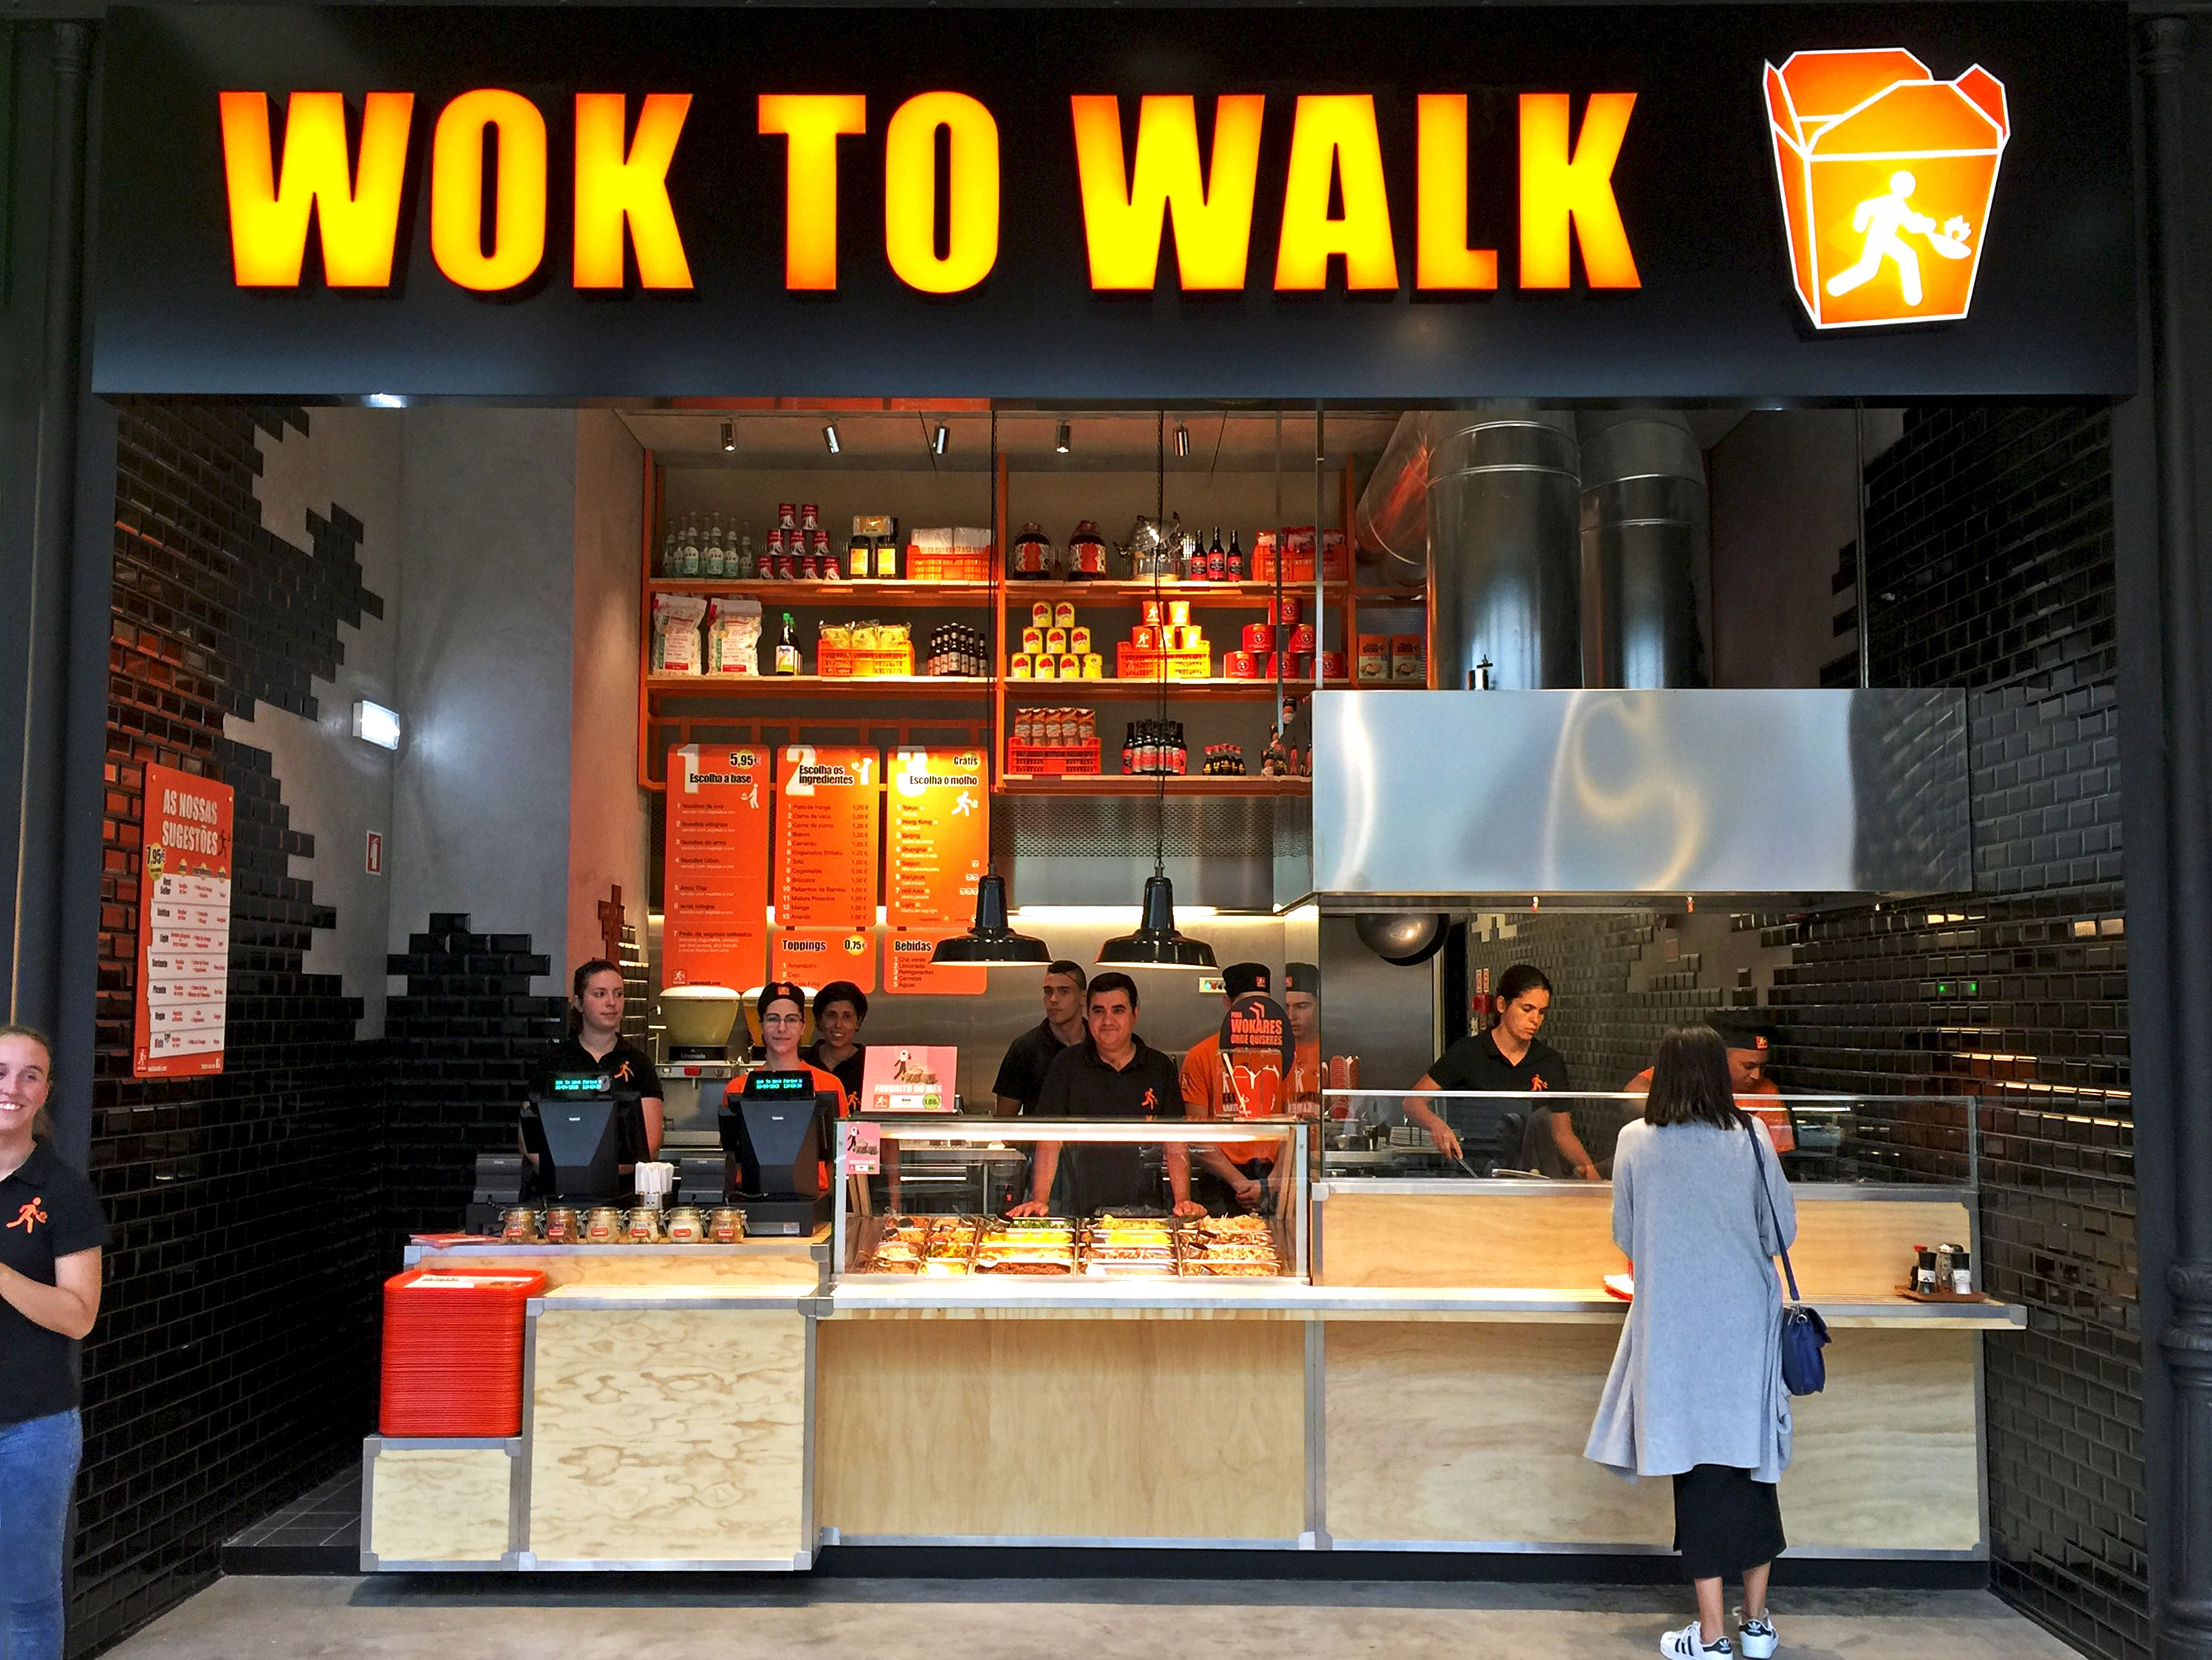 Chinese Kitchen Range Hood Best Lighting For Image Result Wok Away | To Walk Pinterest Woks